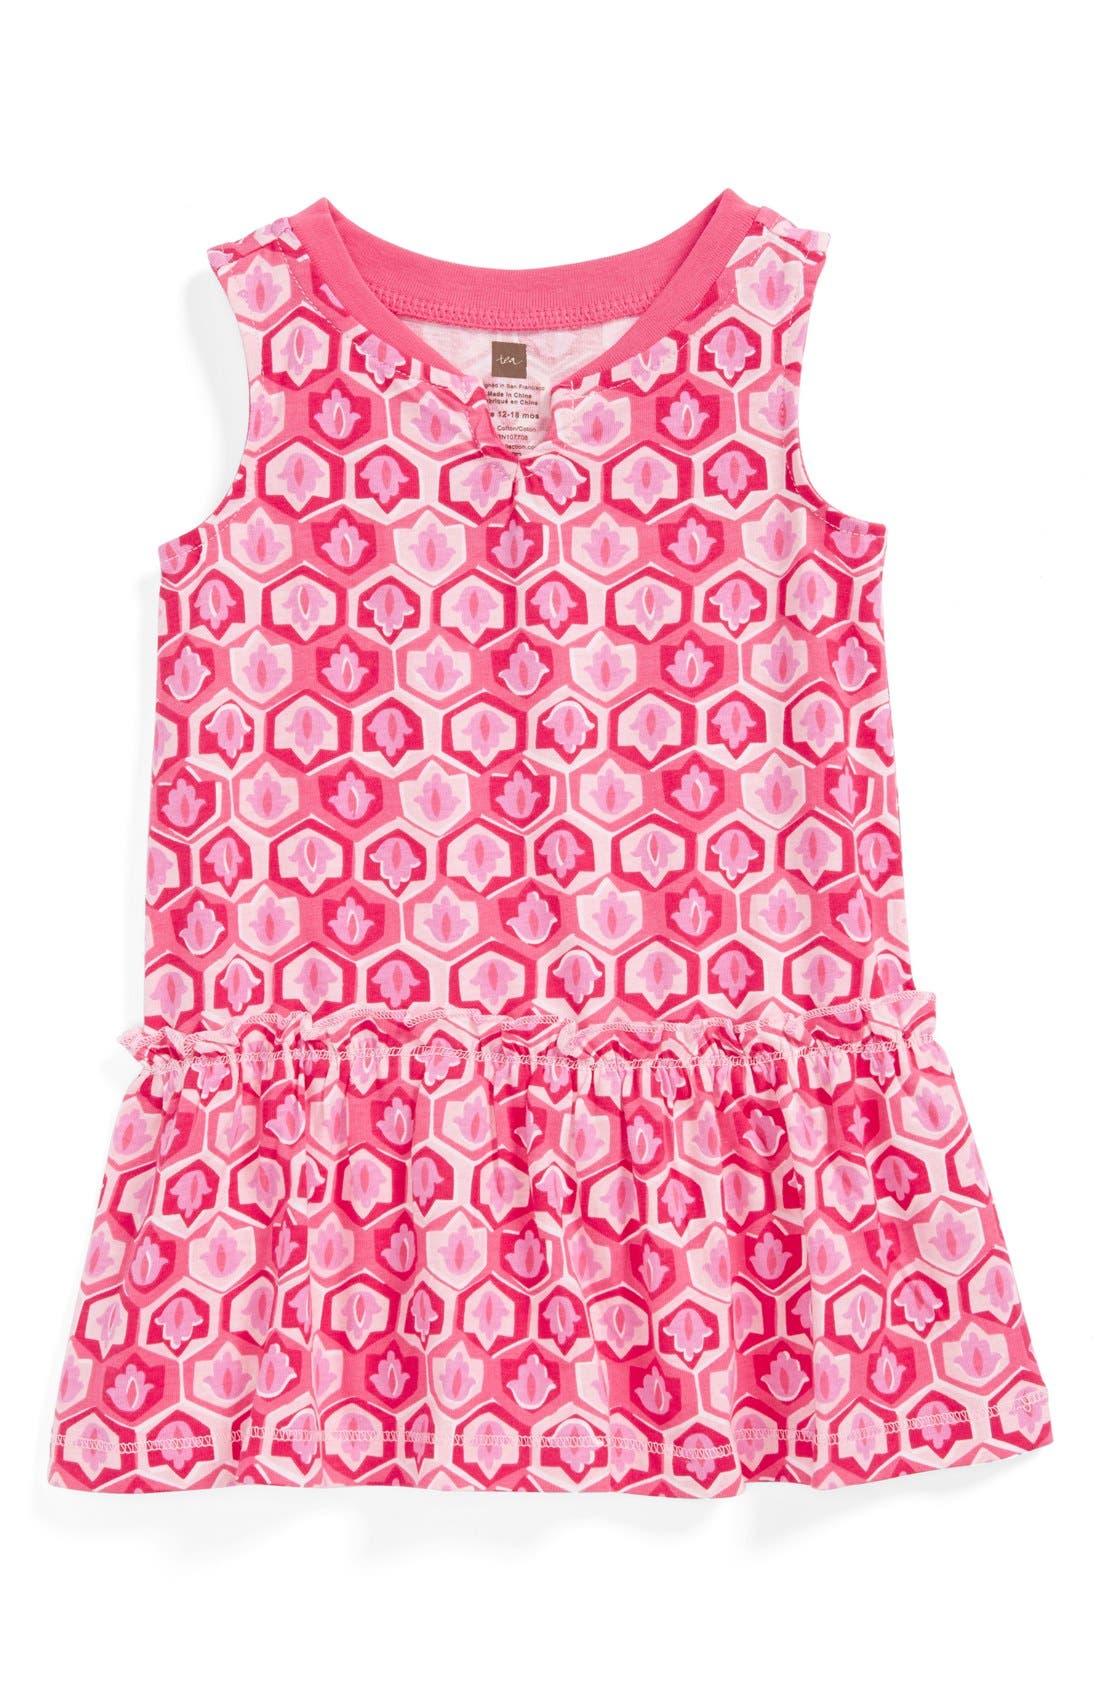 Alternate Image 1 Selected - Tea Collection 'Fatima' Drop Waist Dress (Baby Girls)